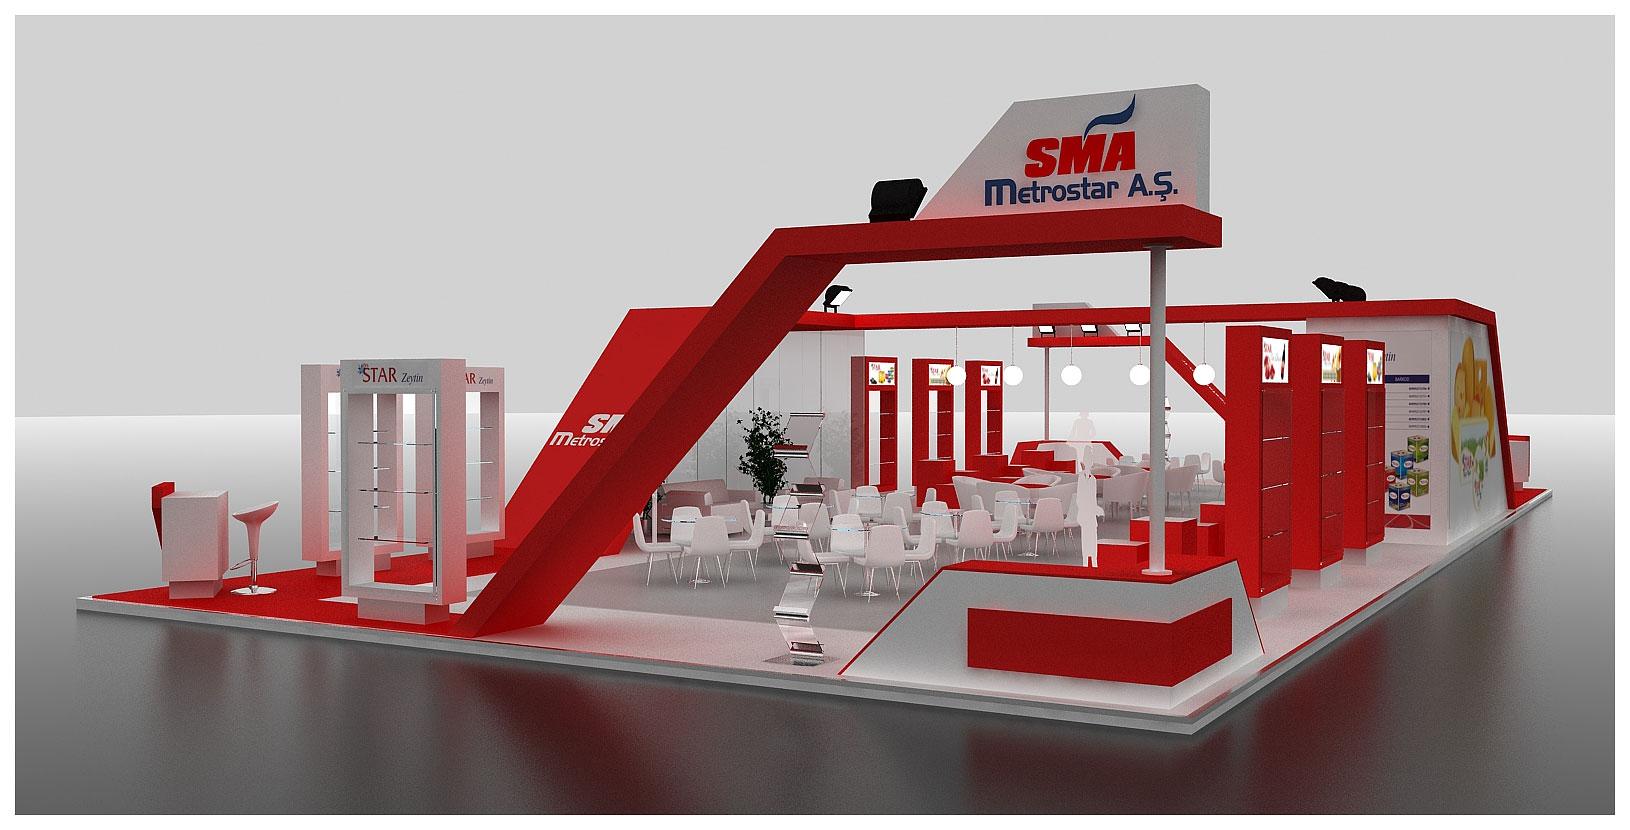 SMA Exhibition Stand Design 3D